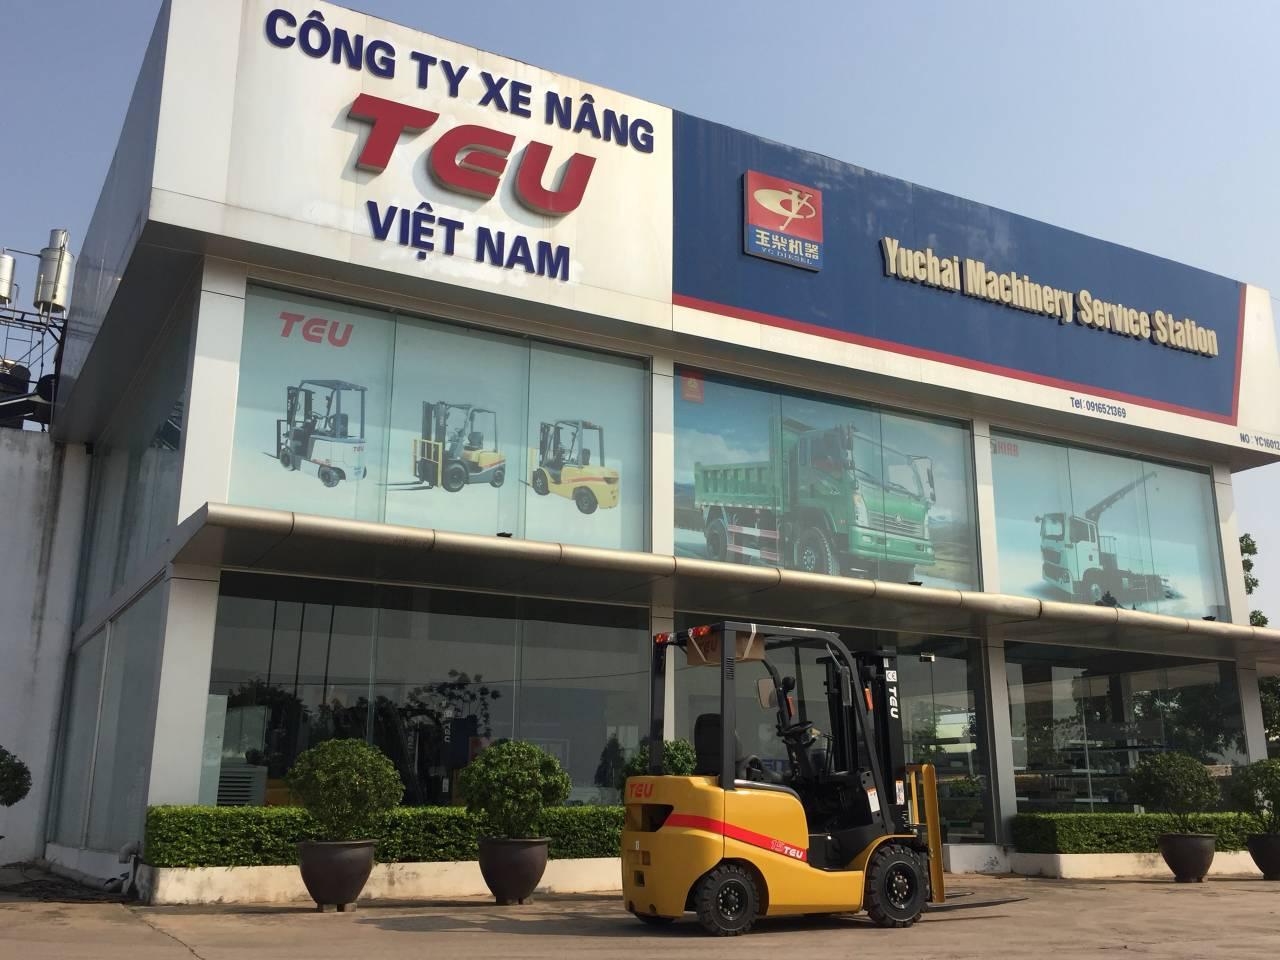 xe-nang-dau-1-5-tan-tai-showroom